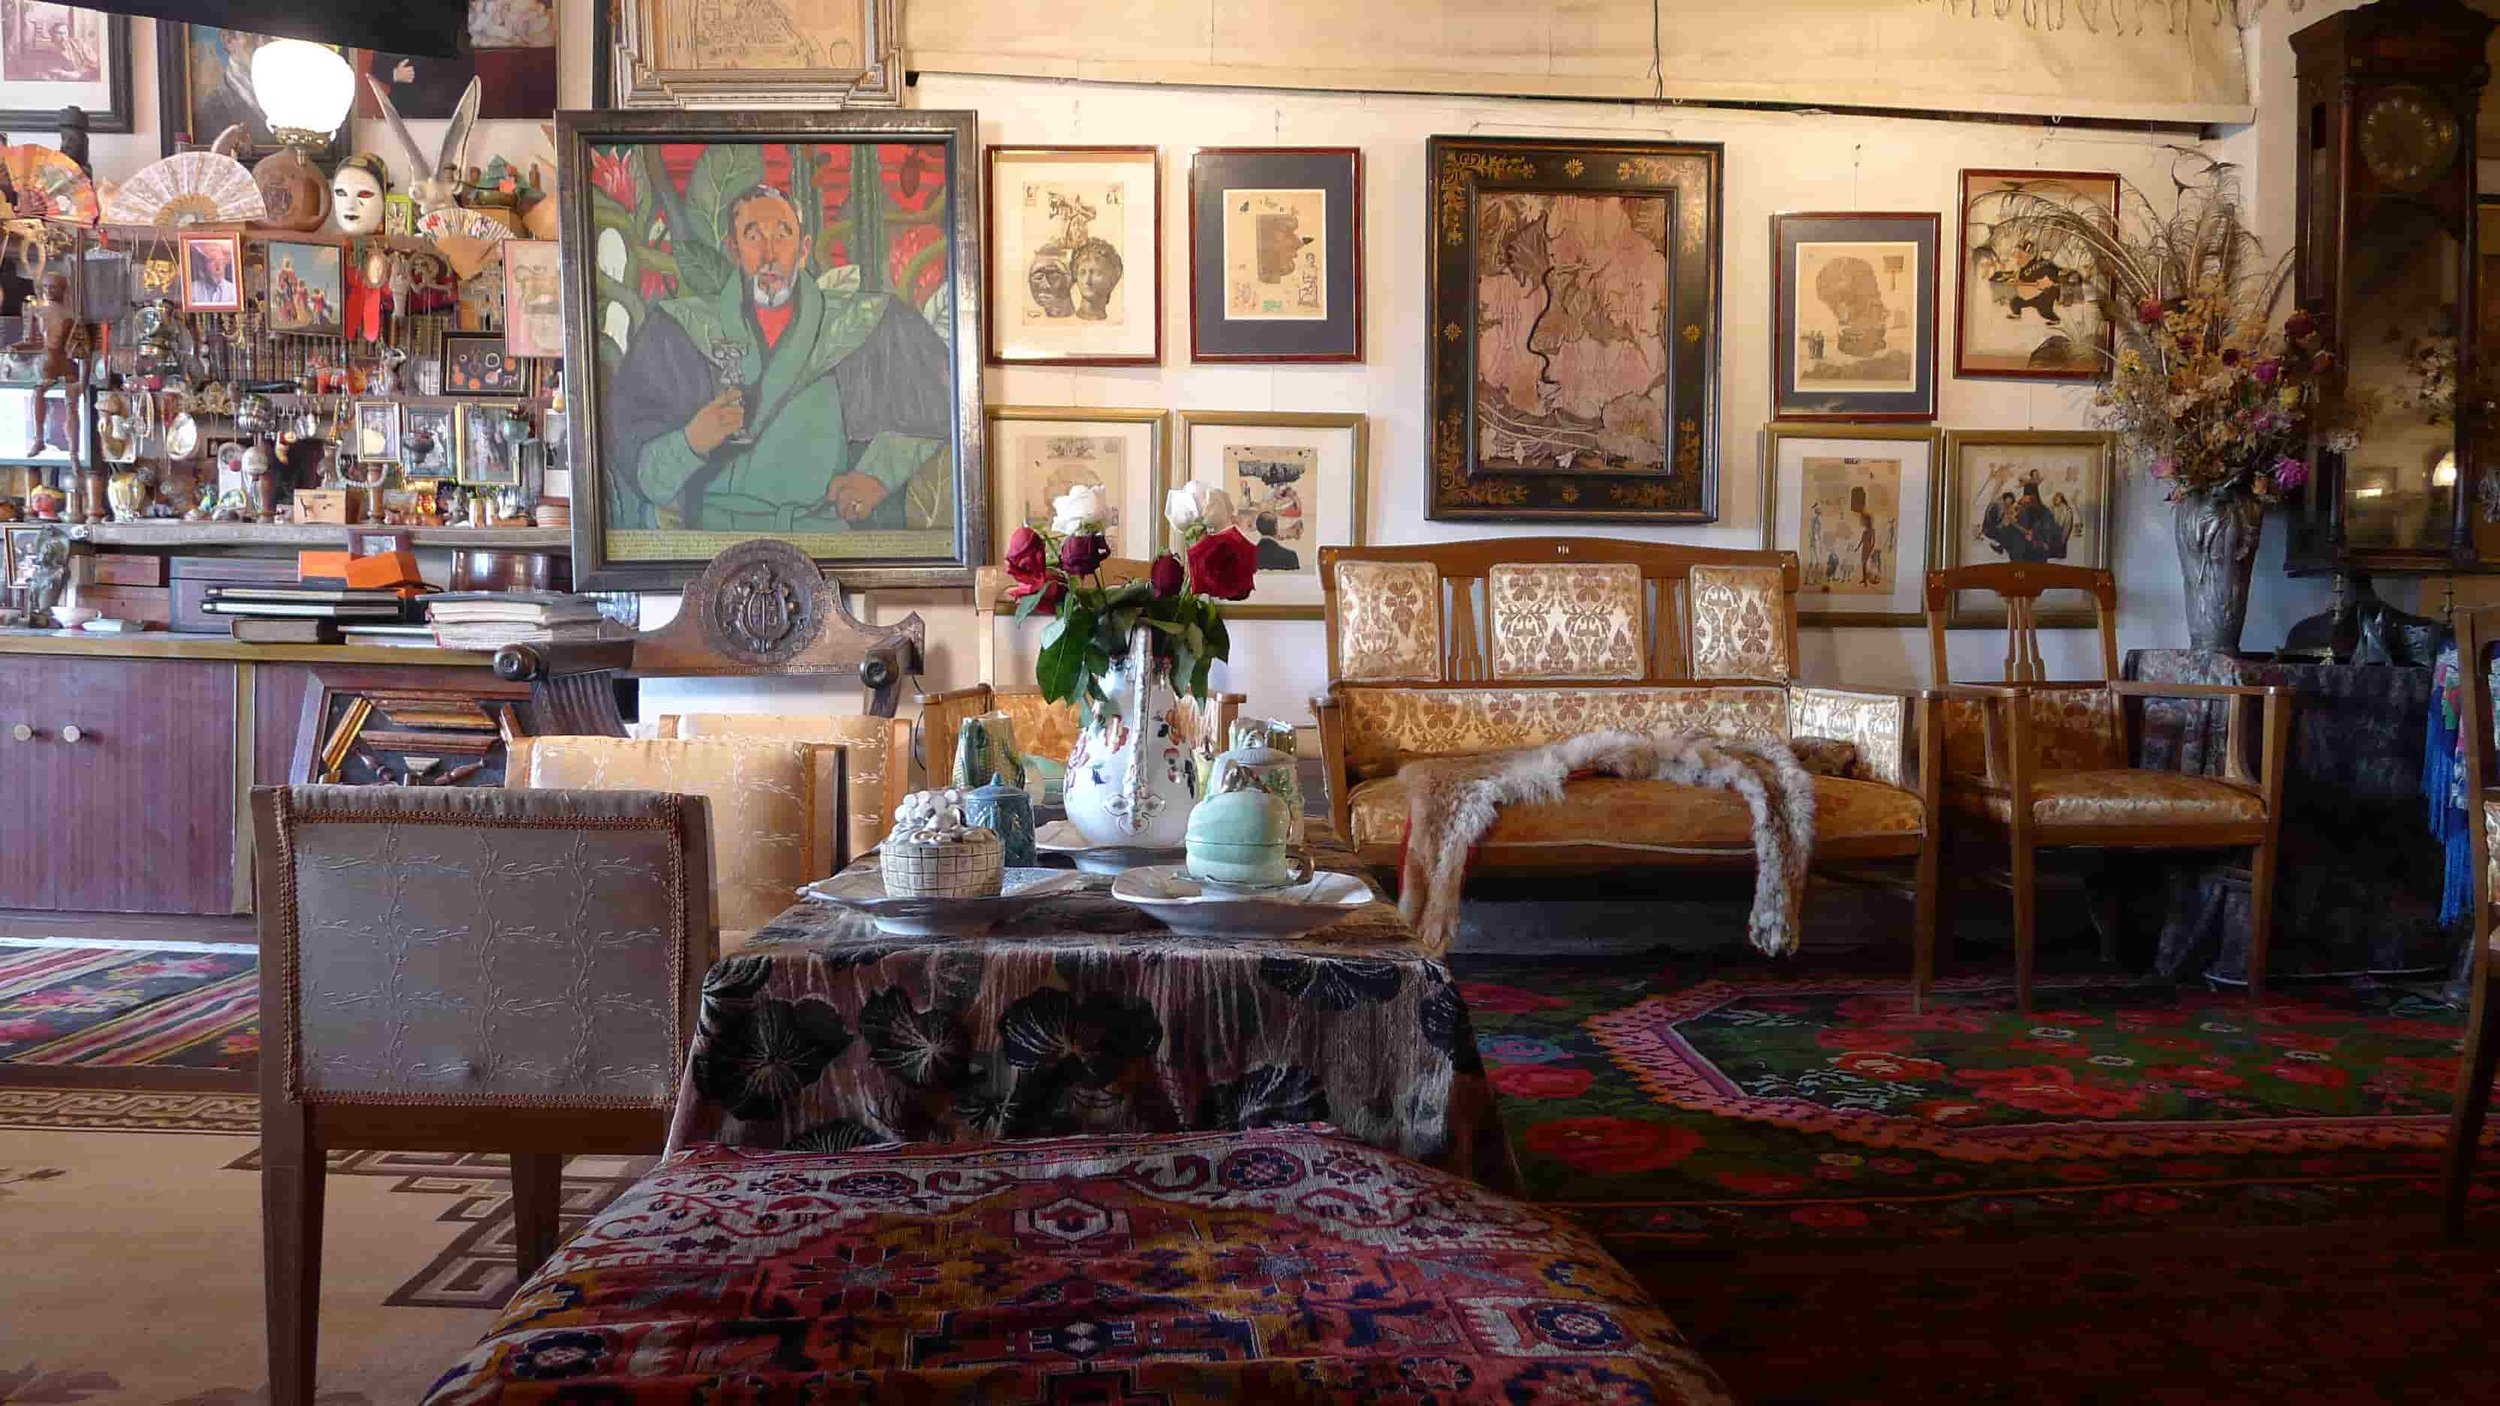 Anatol Brusilovsky's studio in the indie documentary Life is Art